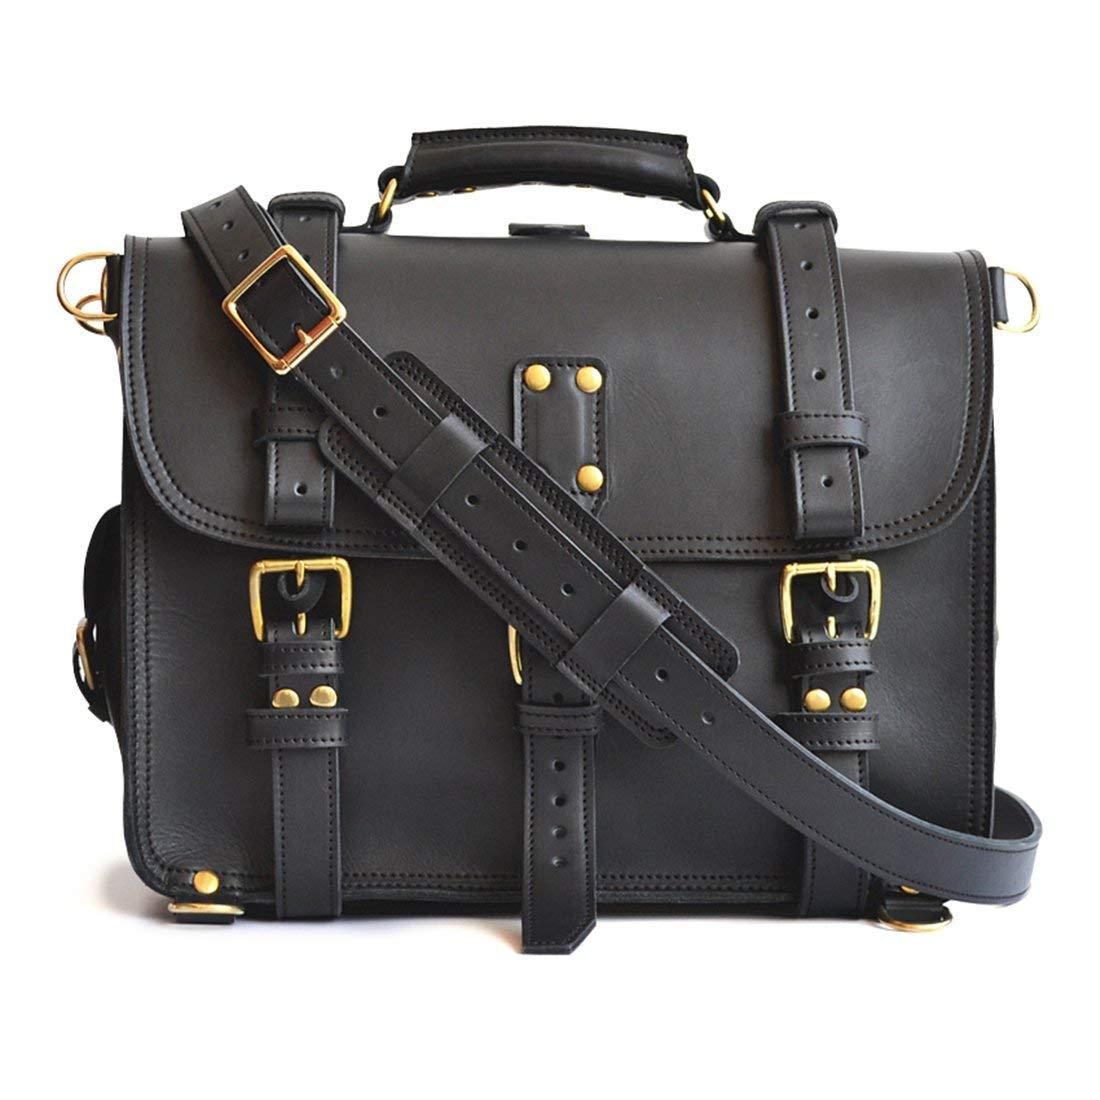 Double Space Briefcase, Black - Heavy Duty Leather Messenger Bag Men, Veg Tan Leather Briefcase Mens, Leather Laptop Bag Women, Backpack Satchel, Crossbody Bag